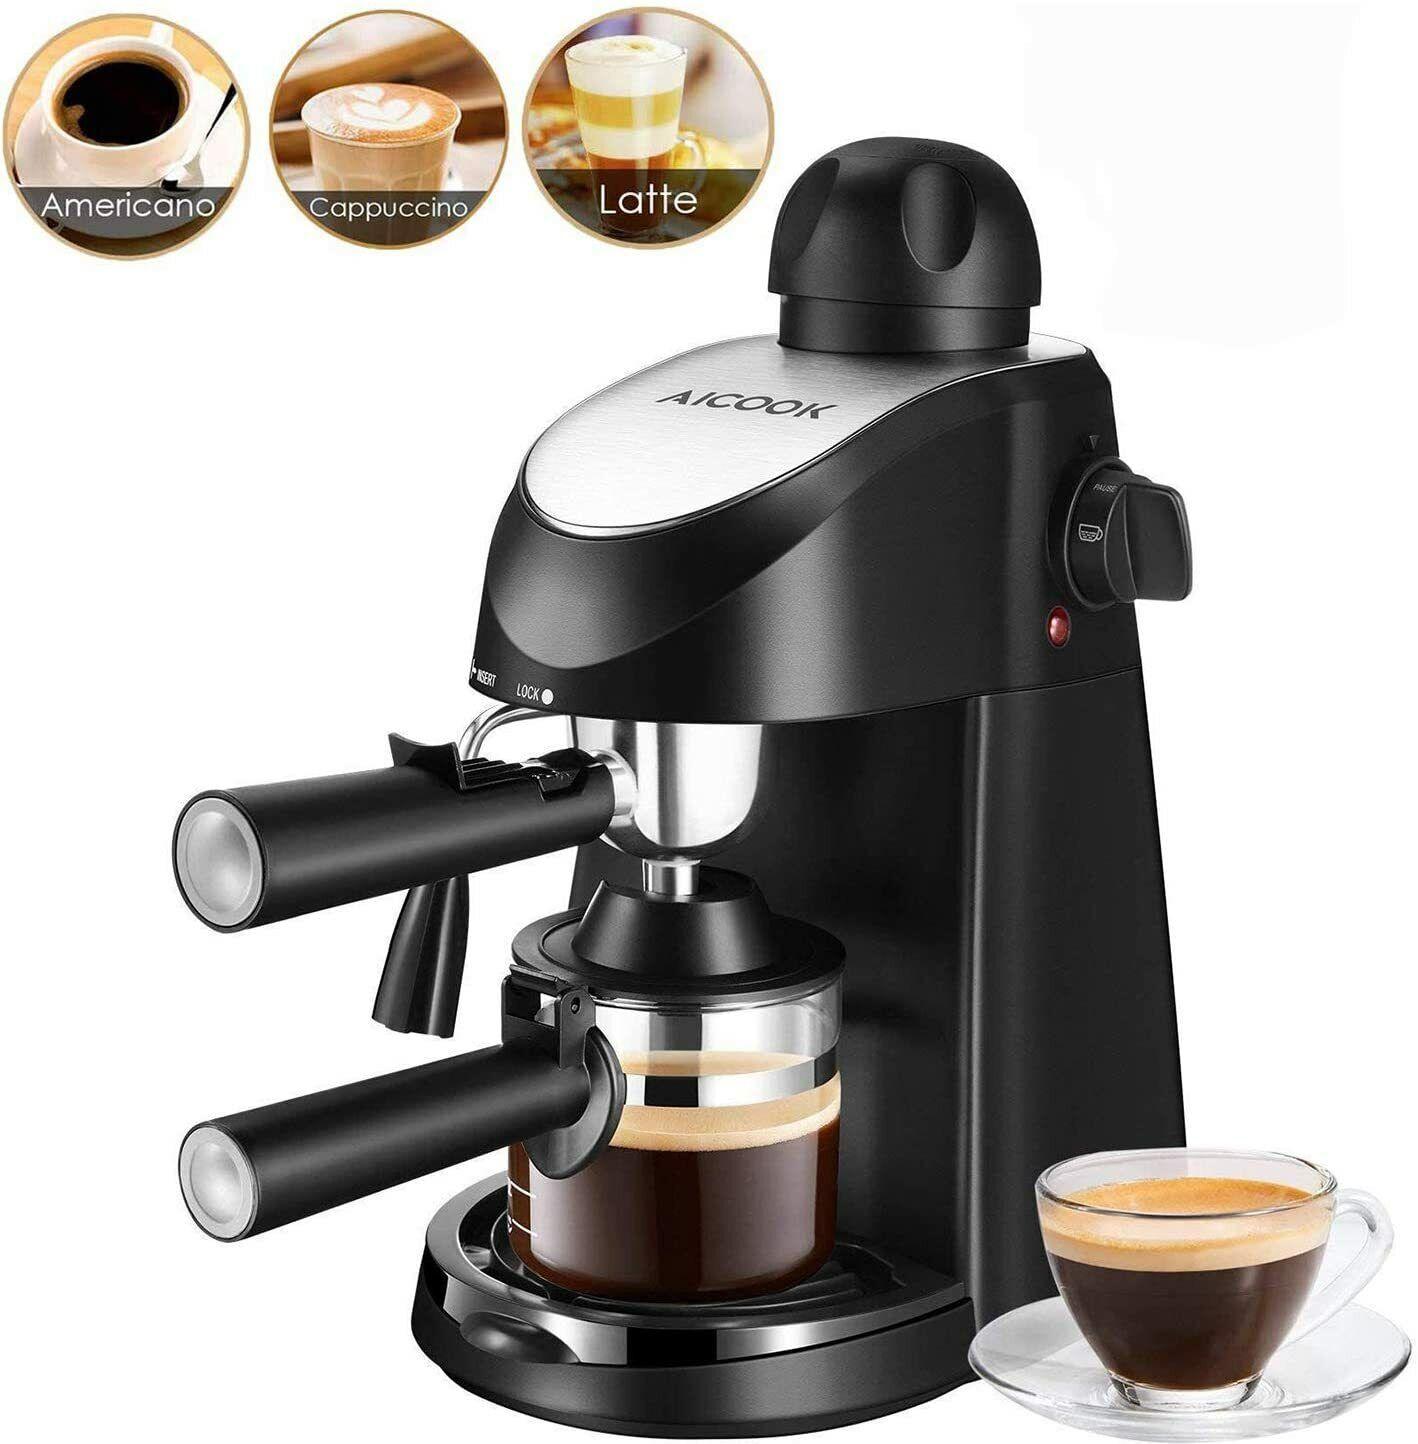 Cappuccino Espresso Machine Coffee Maker 3.5 Bar 4 Cup With